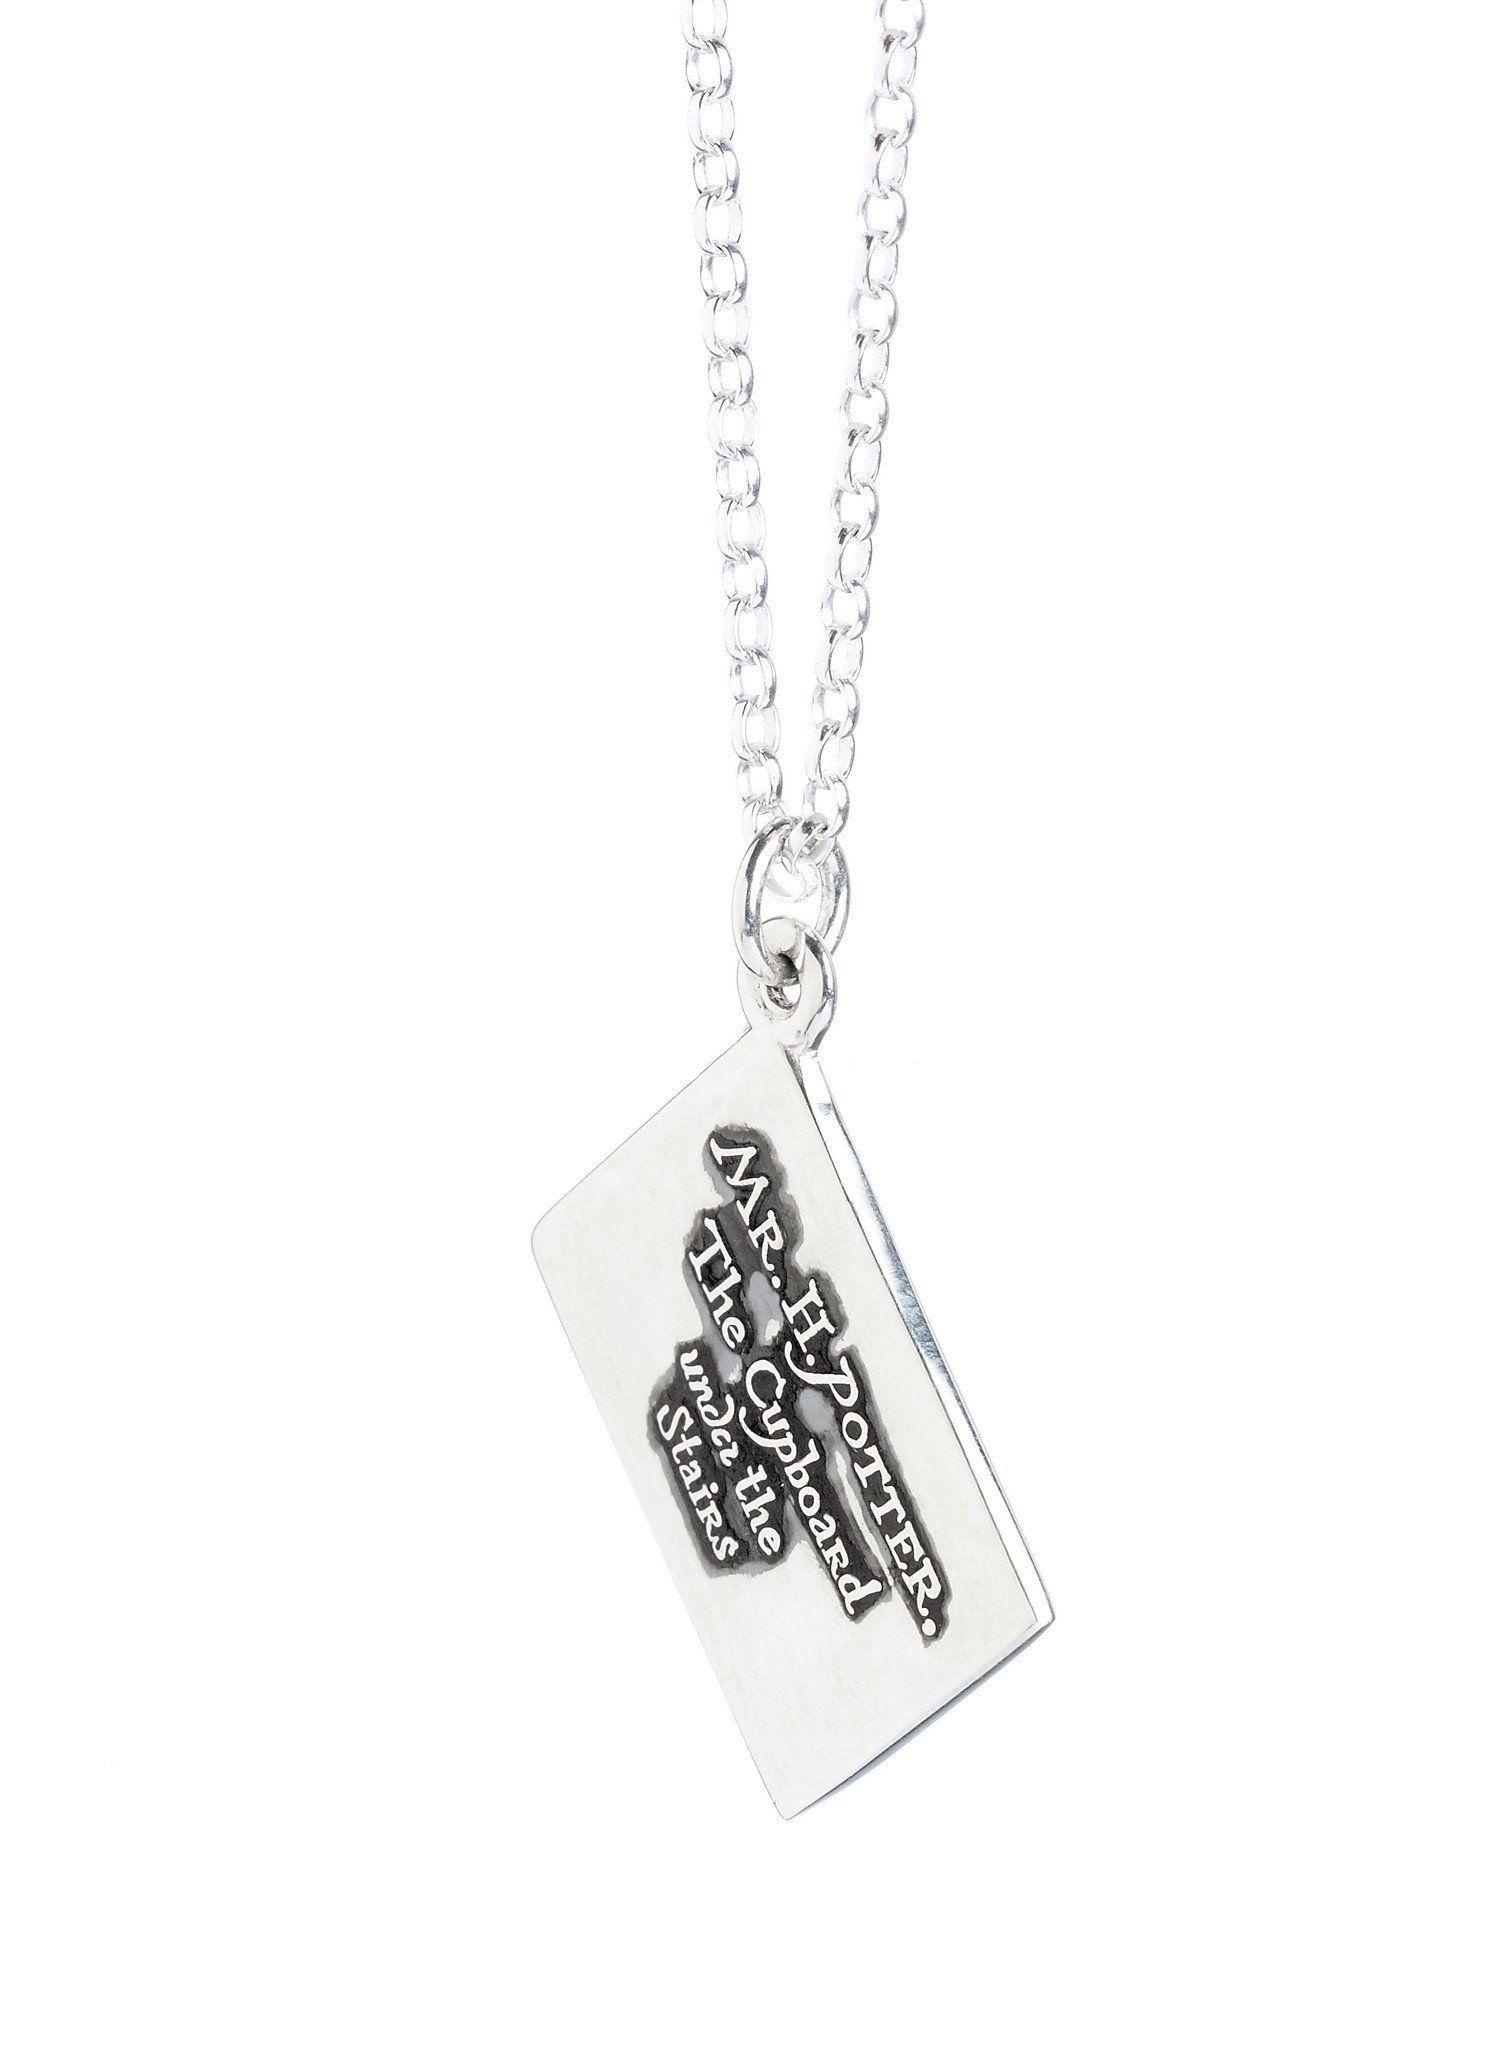 Official harry potter hogwarts acceptance letter charm necklace